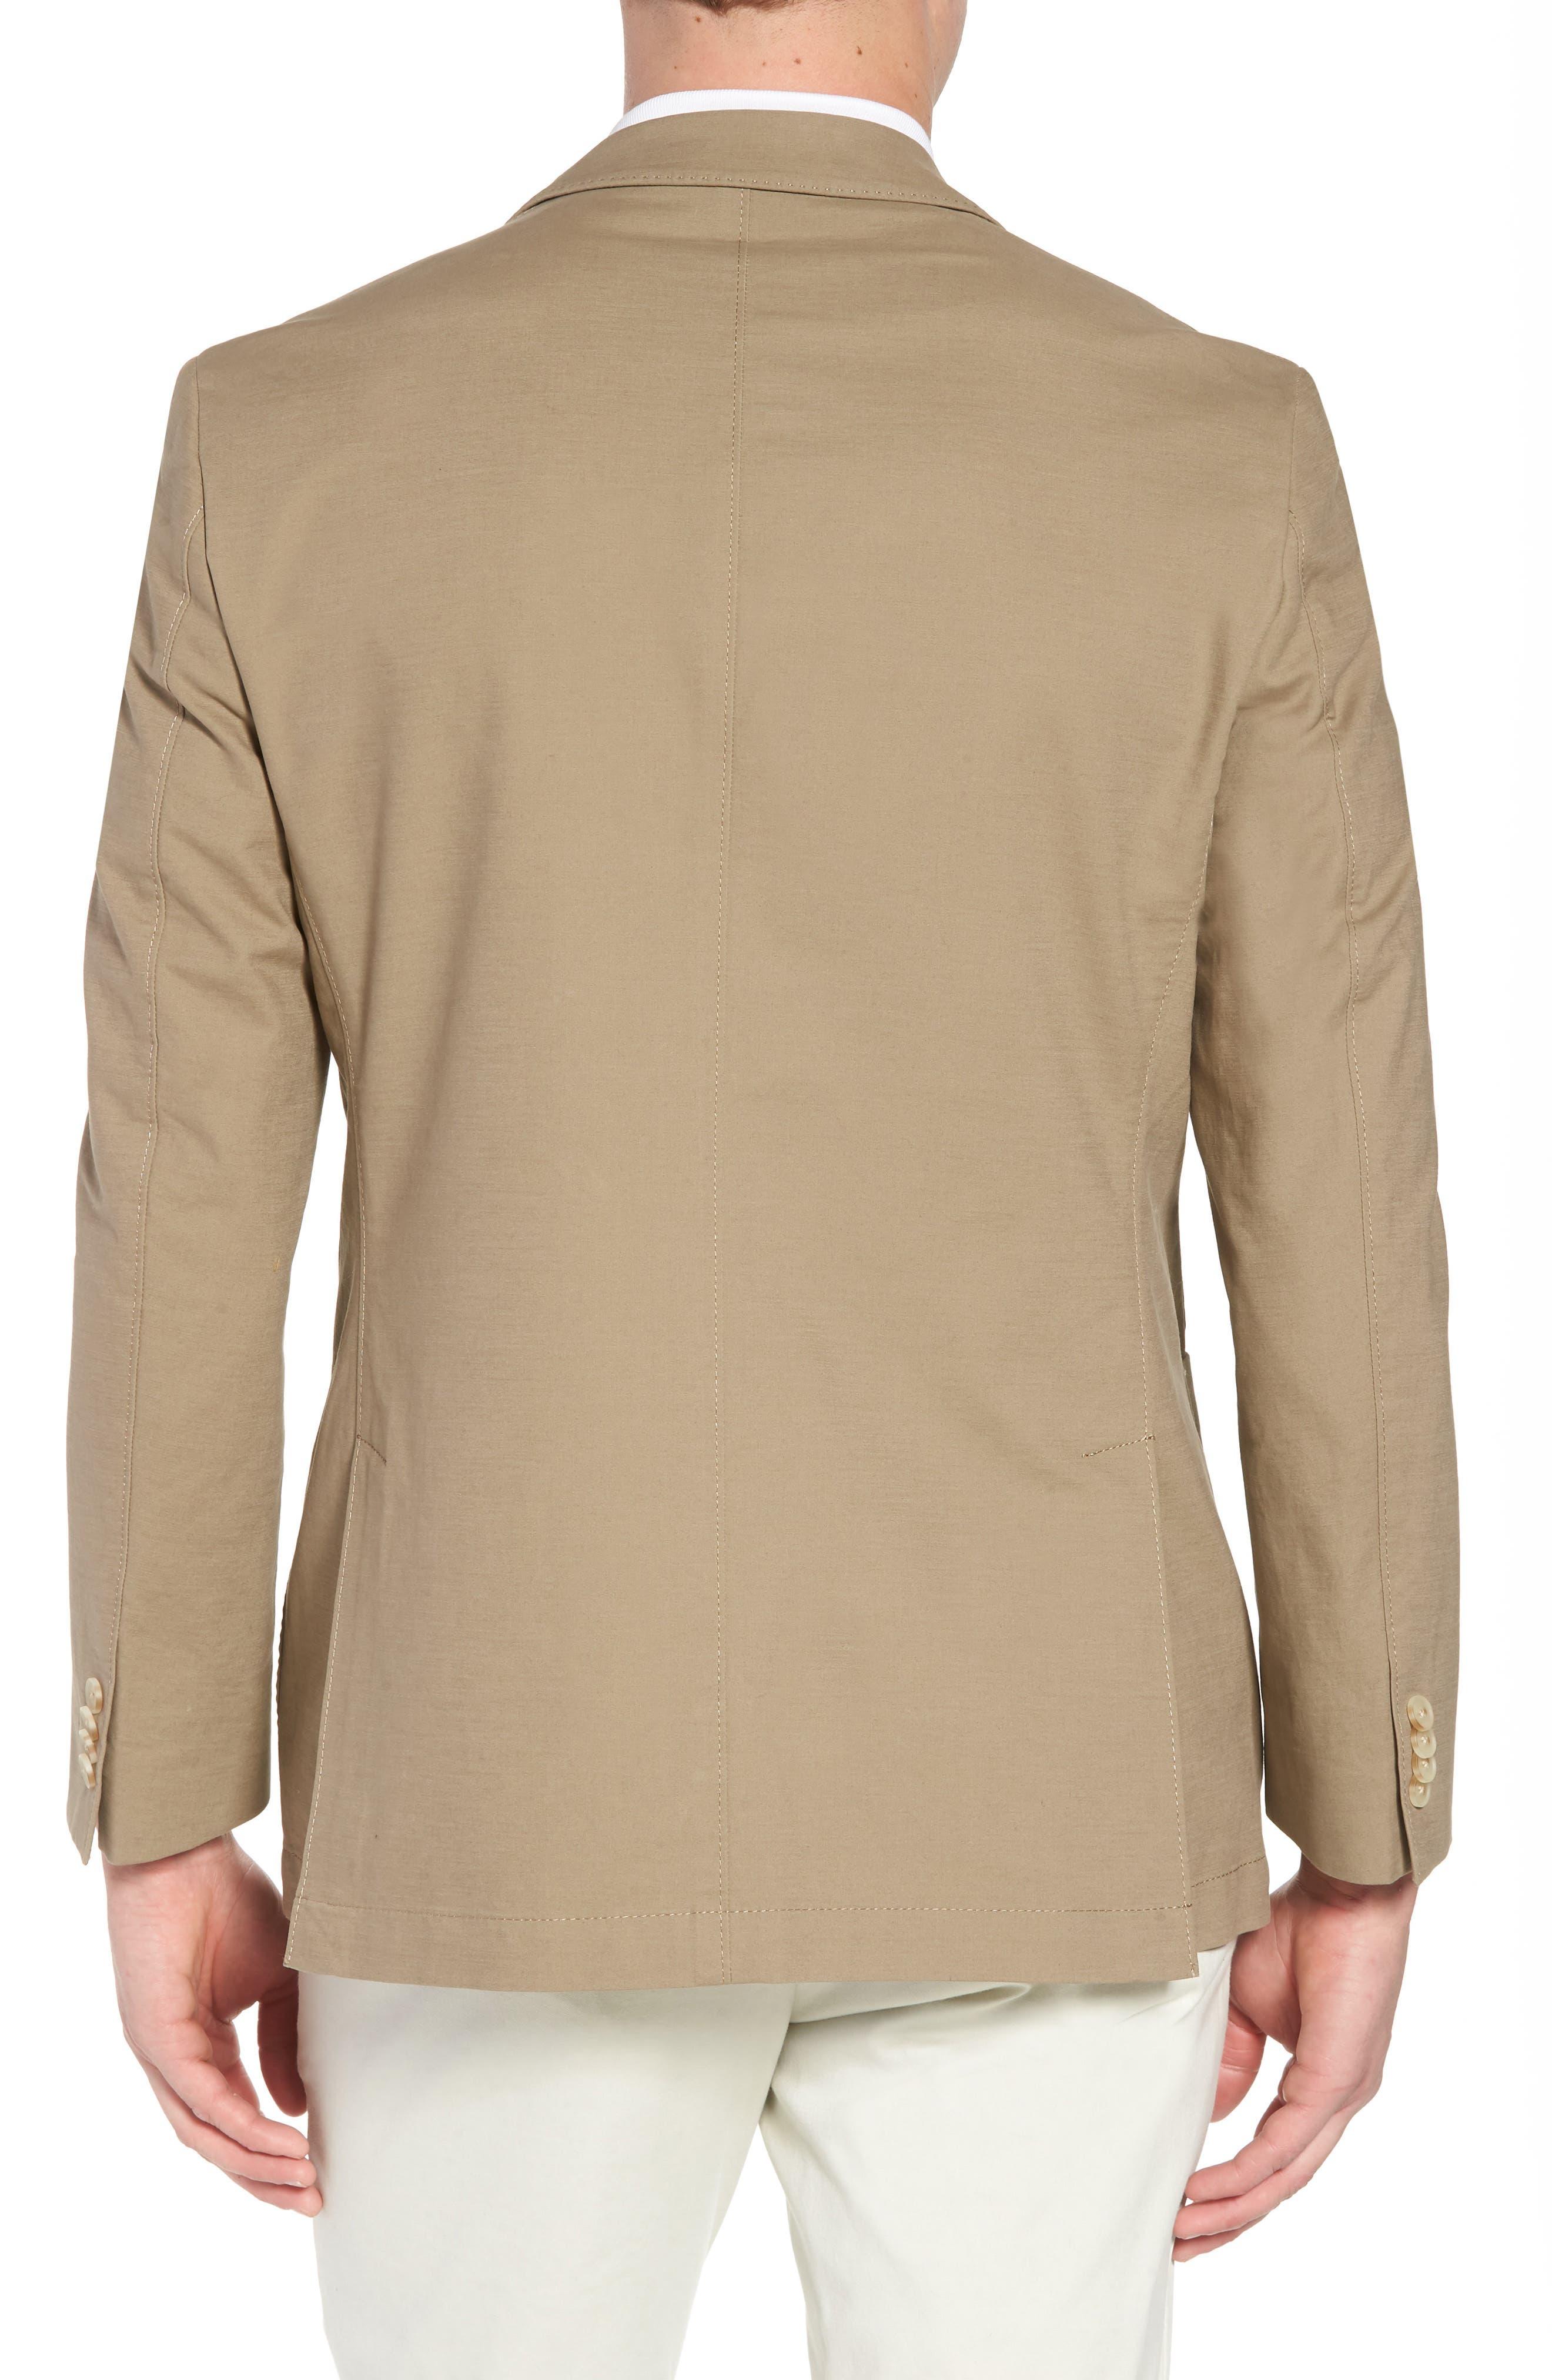 Bono AIM Classic Fit Stretch Cotton Blazer,                             Alternate thumbnail 2, color,                             252